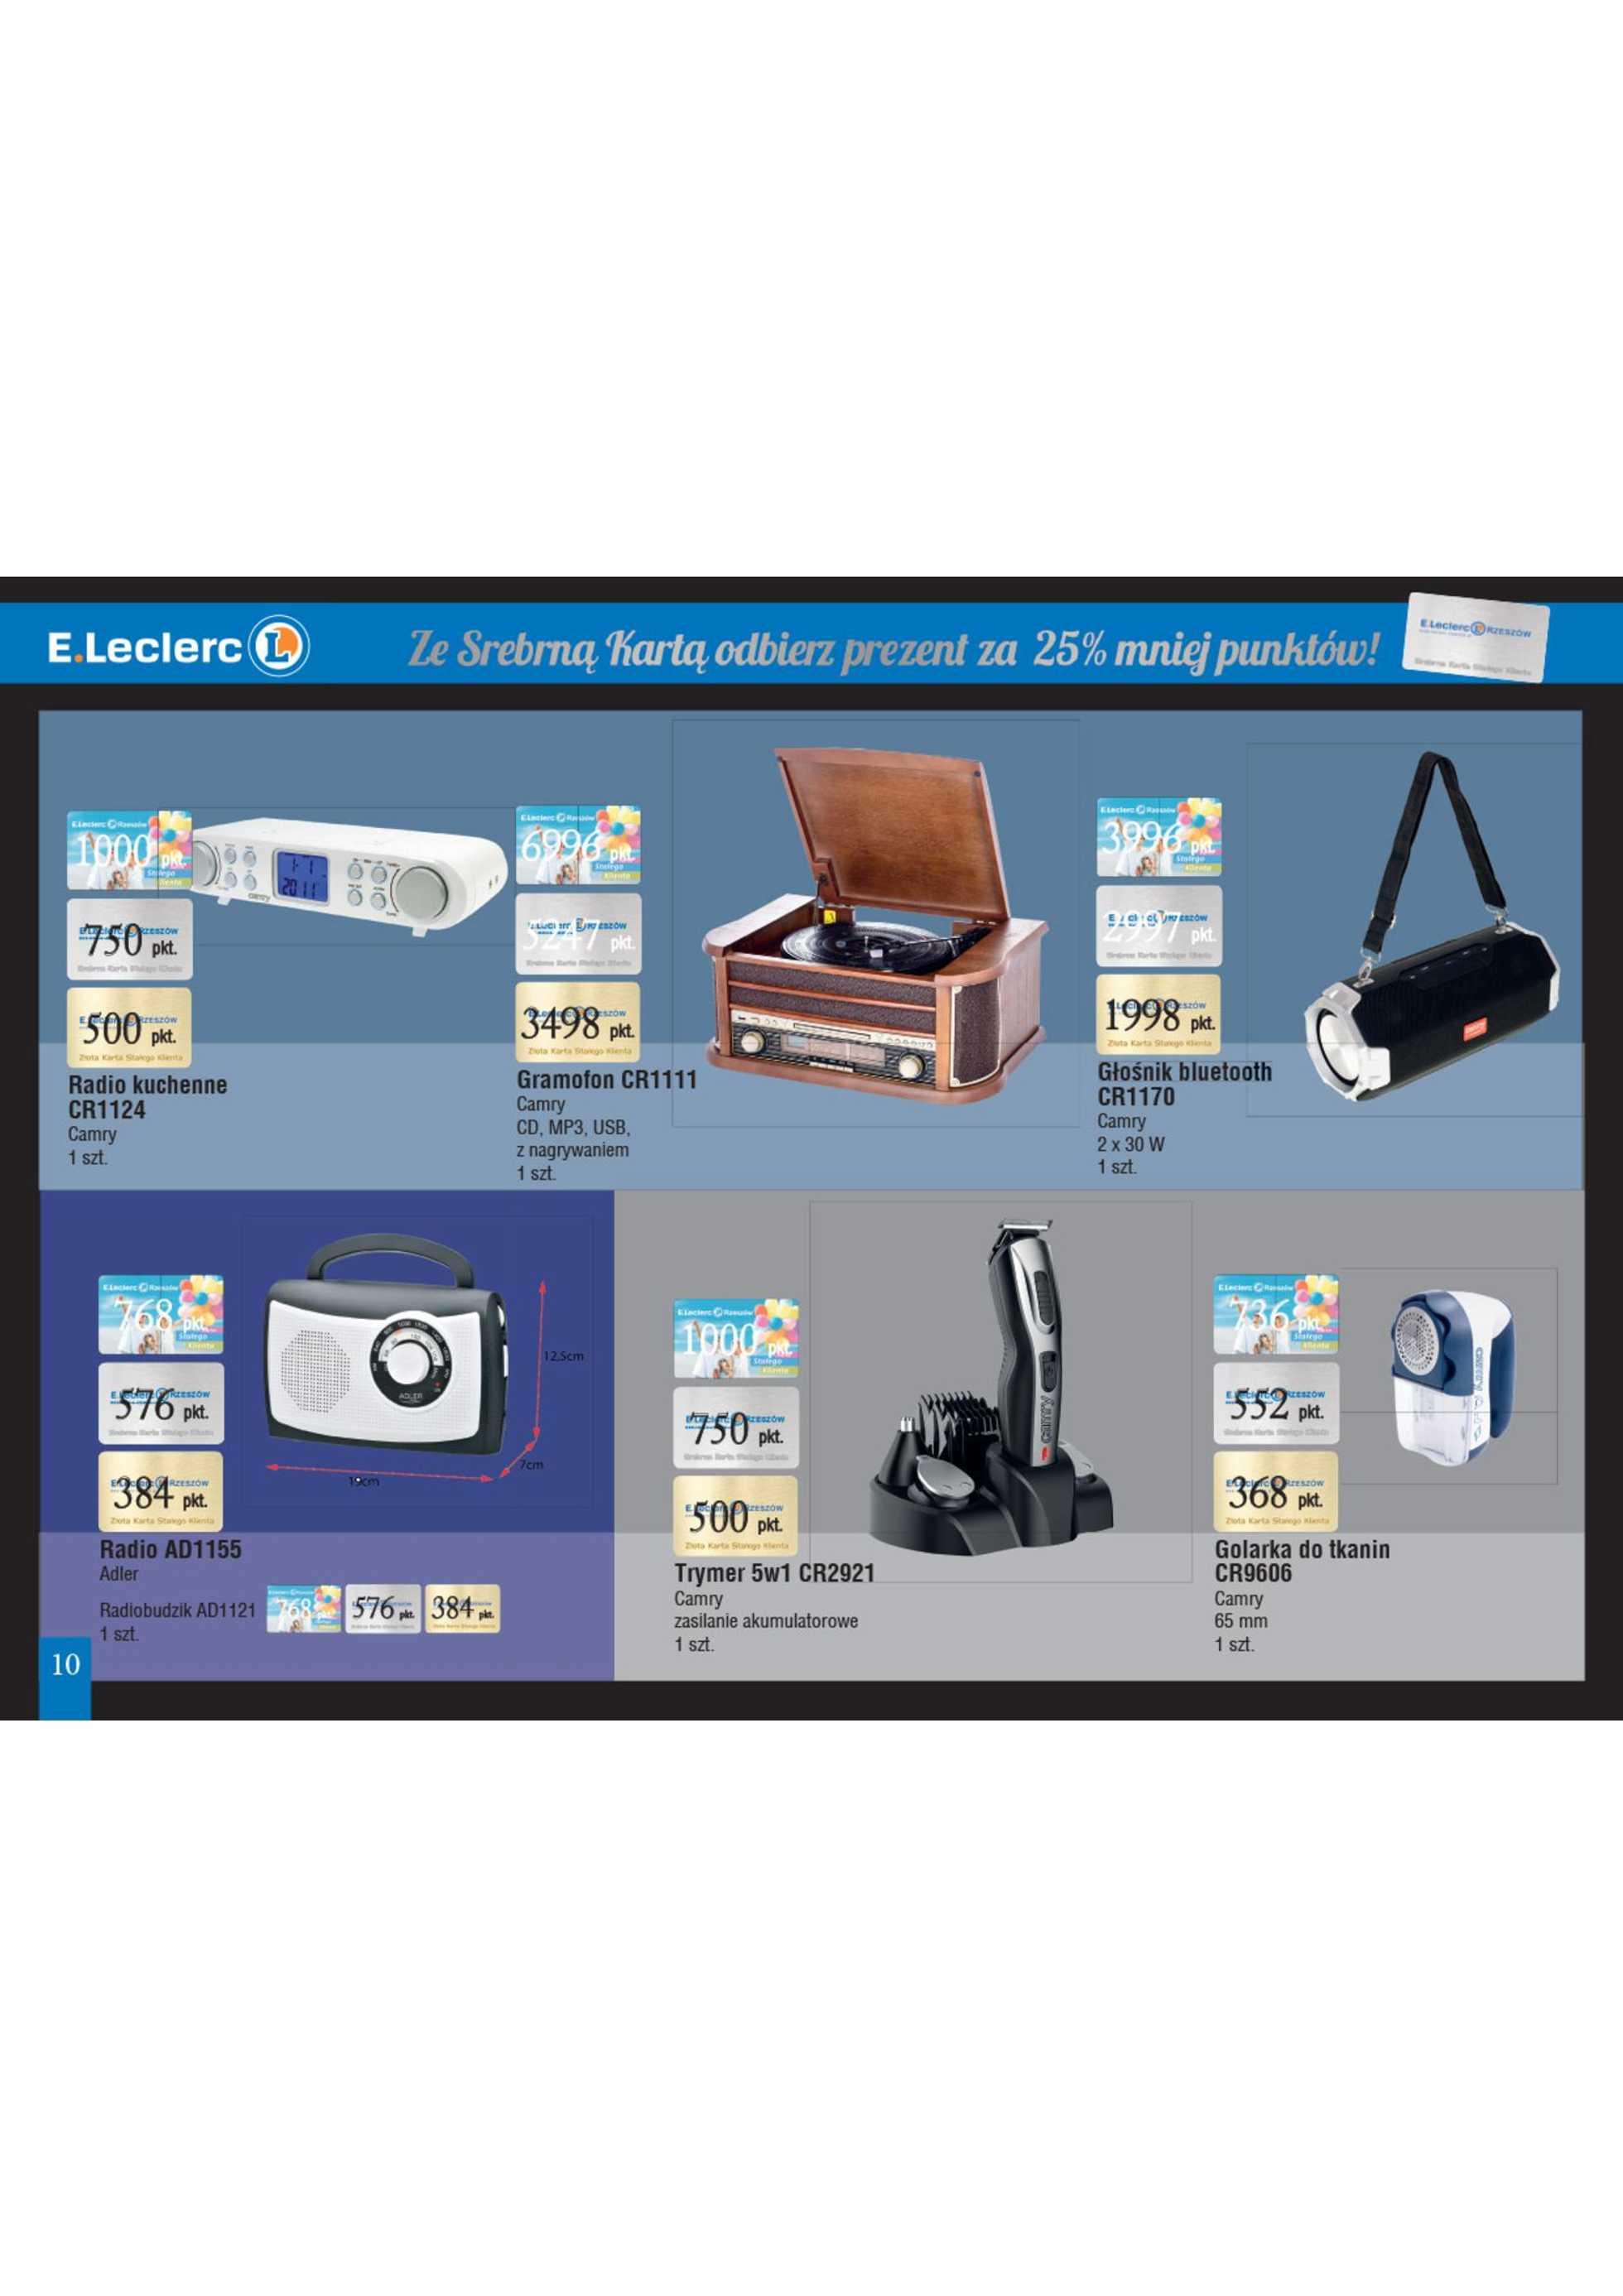 E.Leclerc - gazetka promocyjna ważna od 15.05.2020 do 31.12.2020 - strona 2. W promocji m.in. grill, grill, karta, garnek, karta, garnek